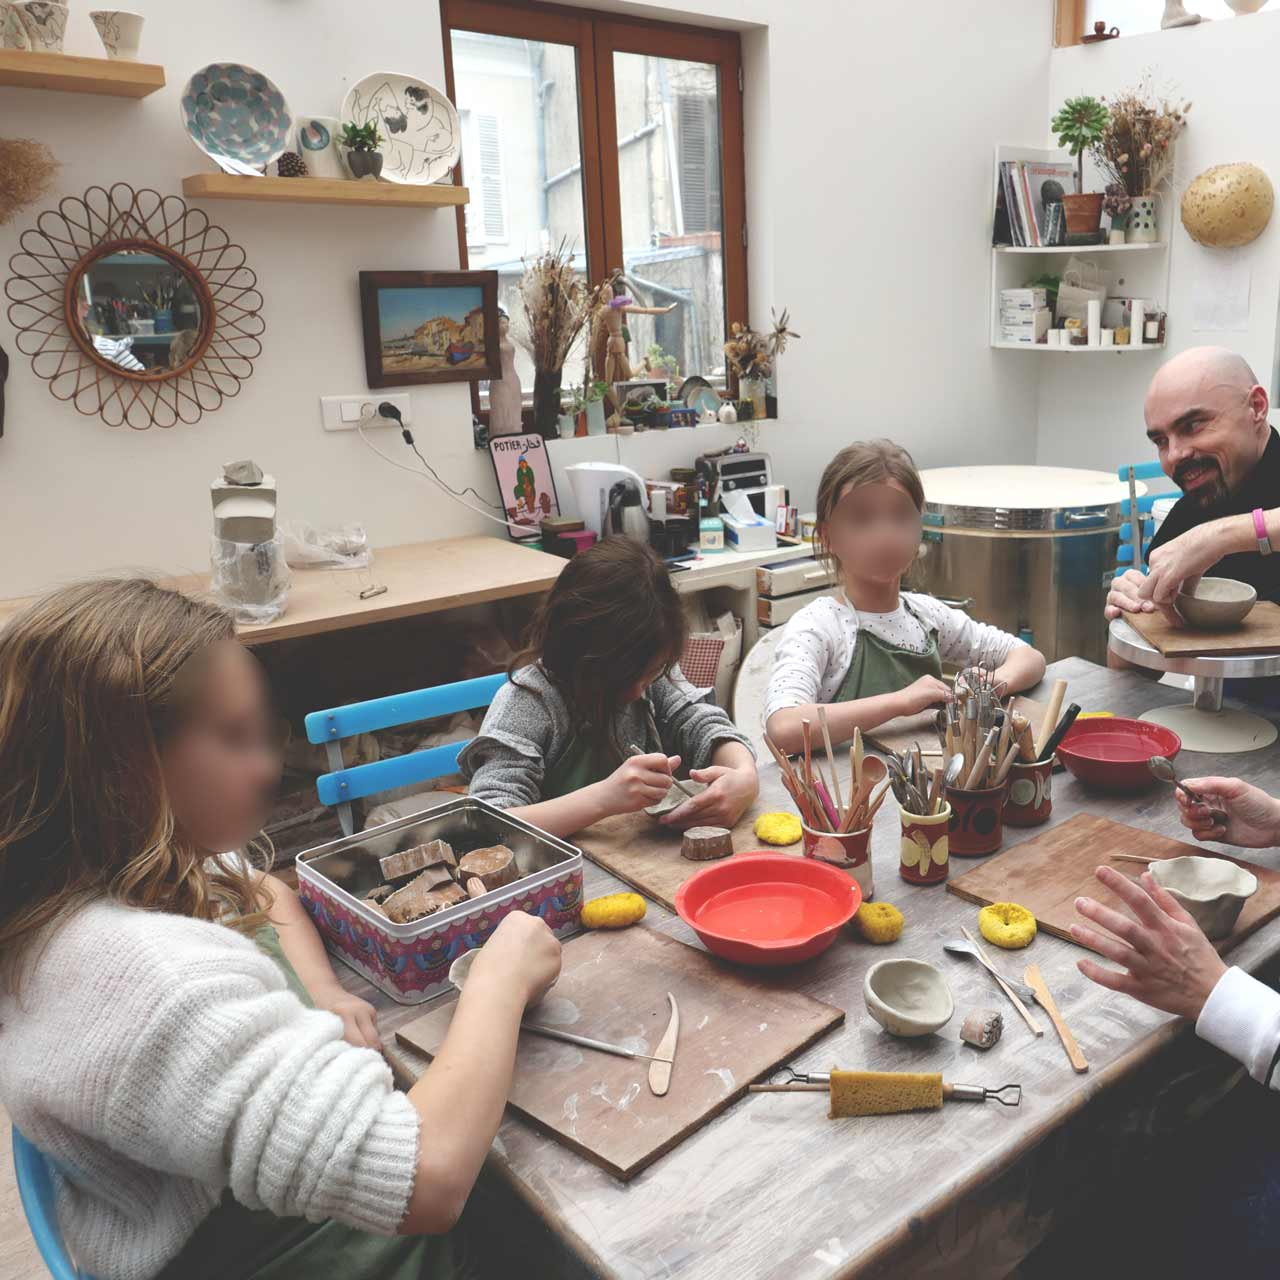 Idee-cadeau-atelier-poterie-5-nelly-genisson